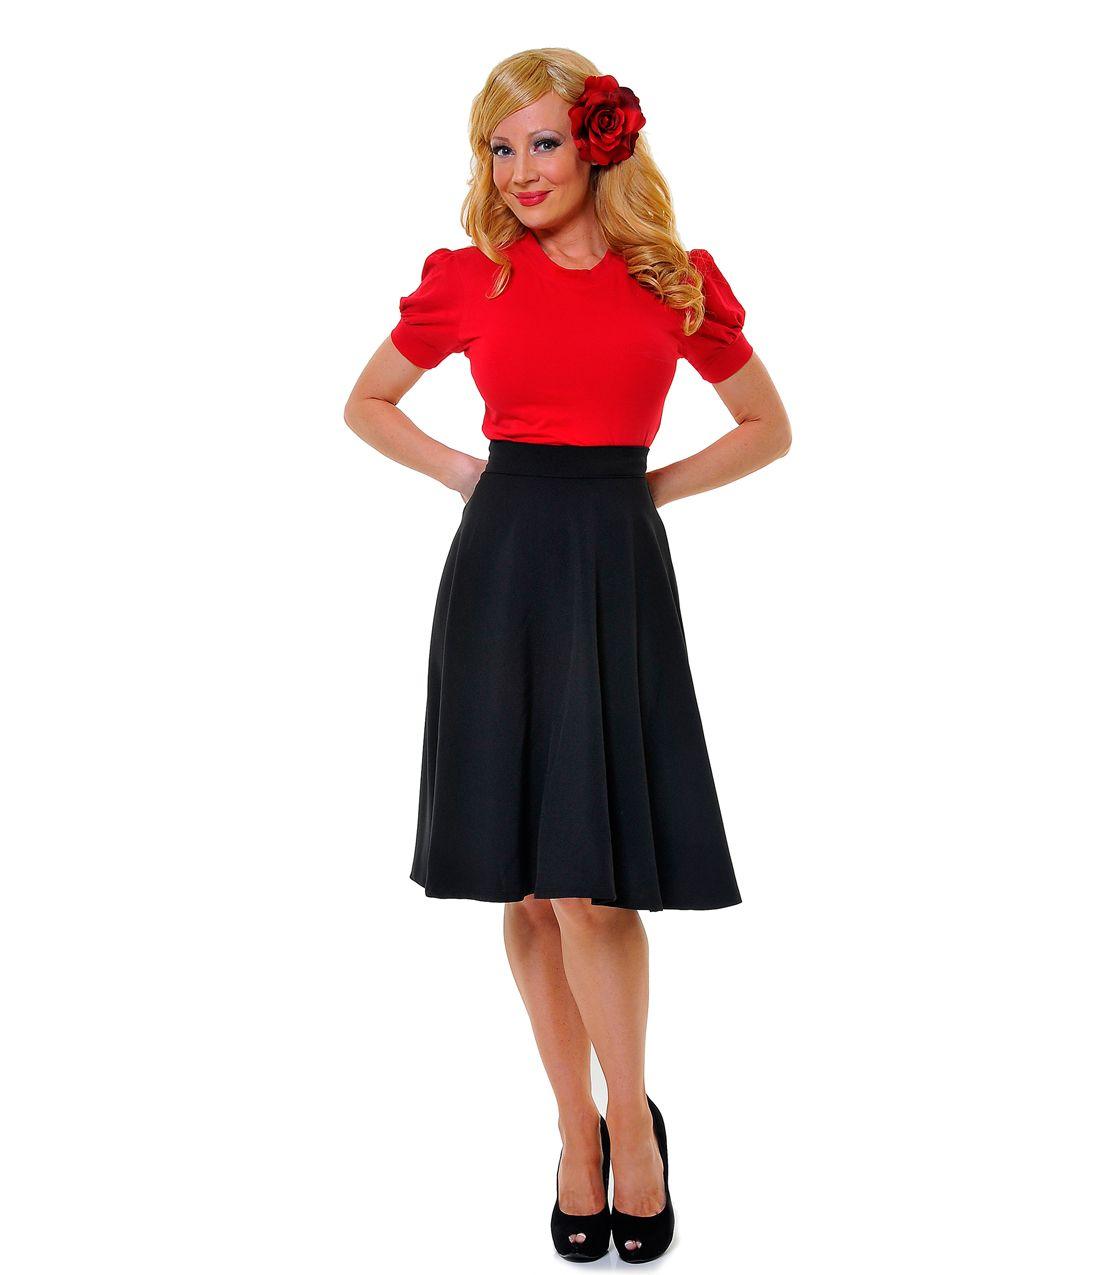 Best seller black high waisted thrills skirt unique vintage